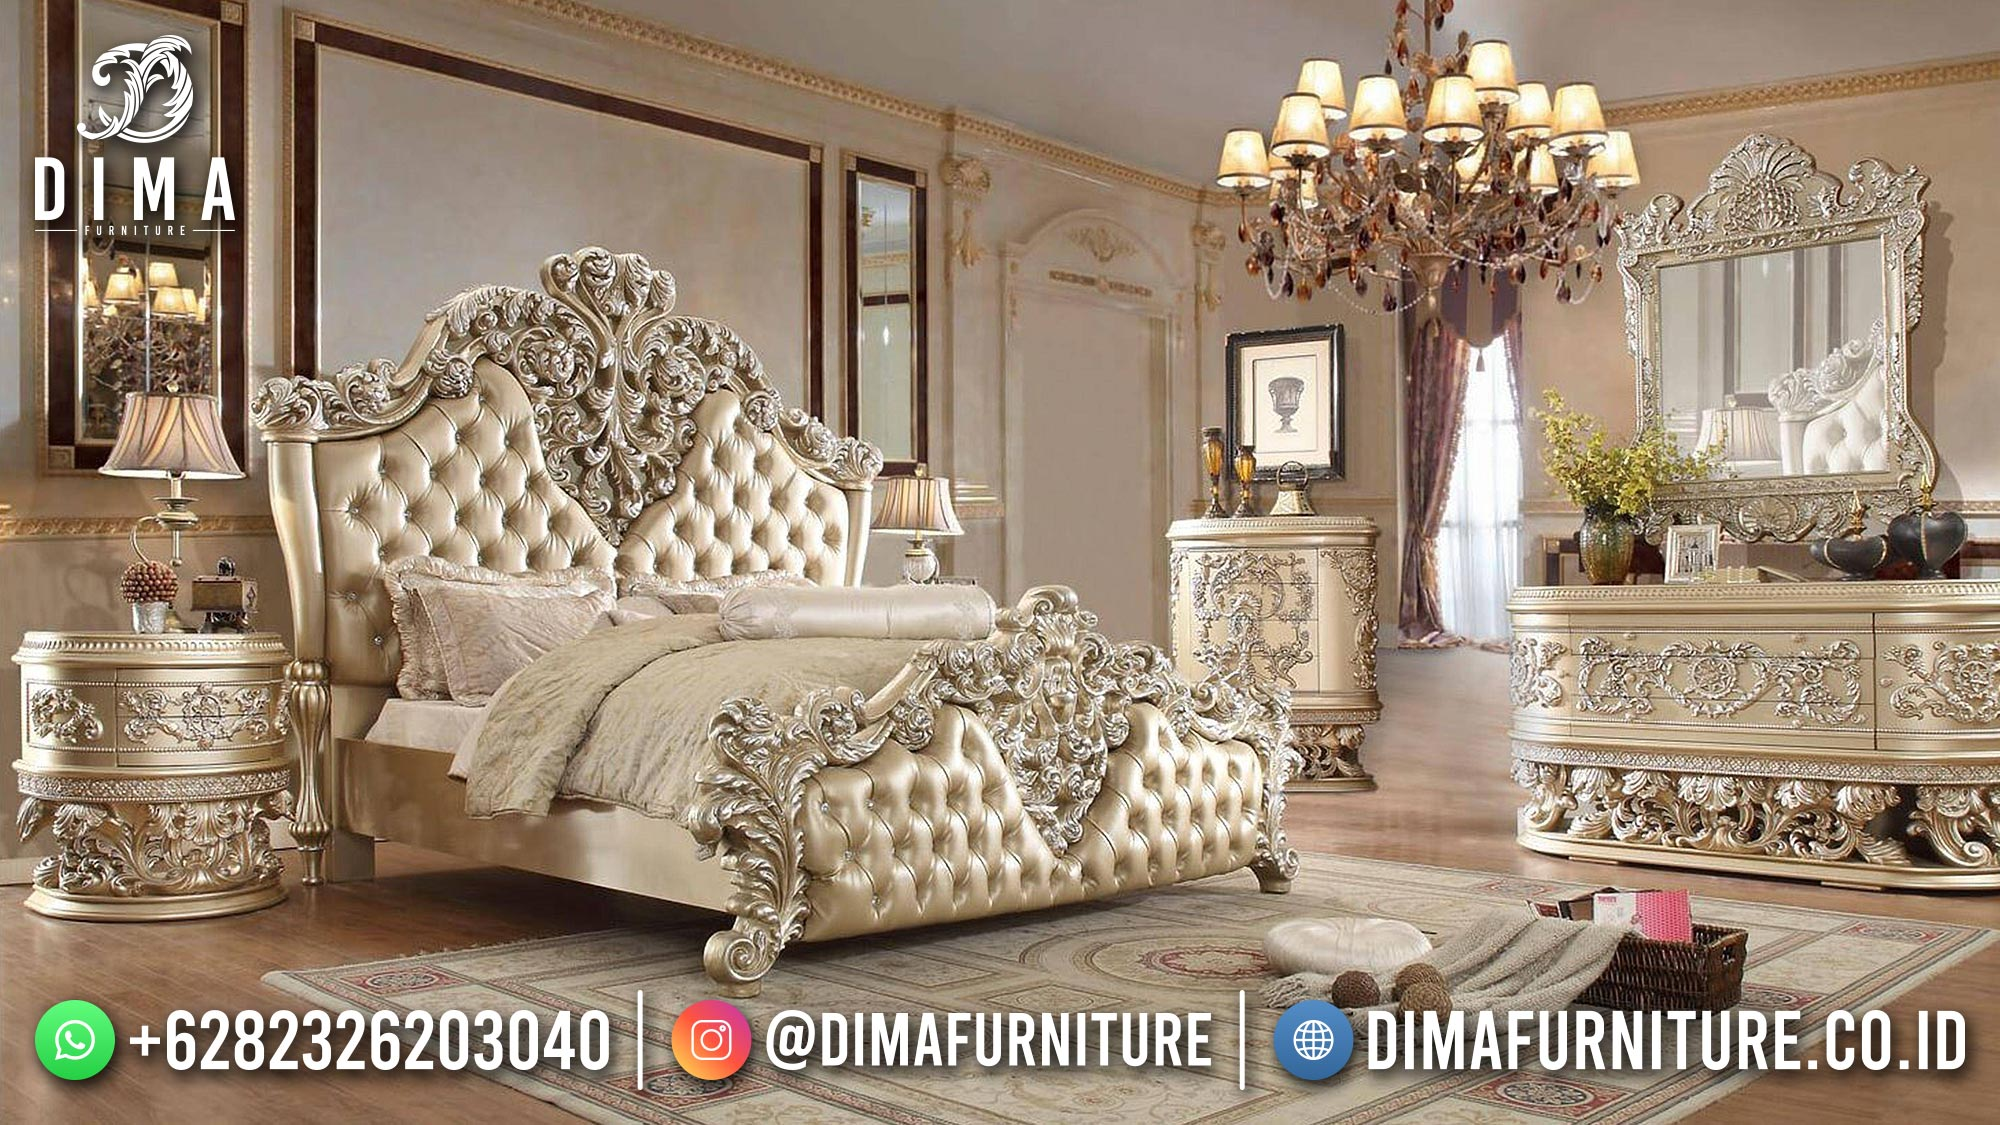 Jual Tempat Tidur Mewah Classic Luxury Elegant Style Hot Sale ST-1420